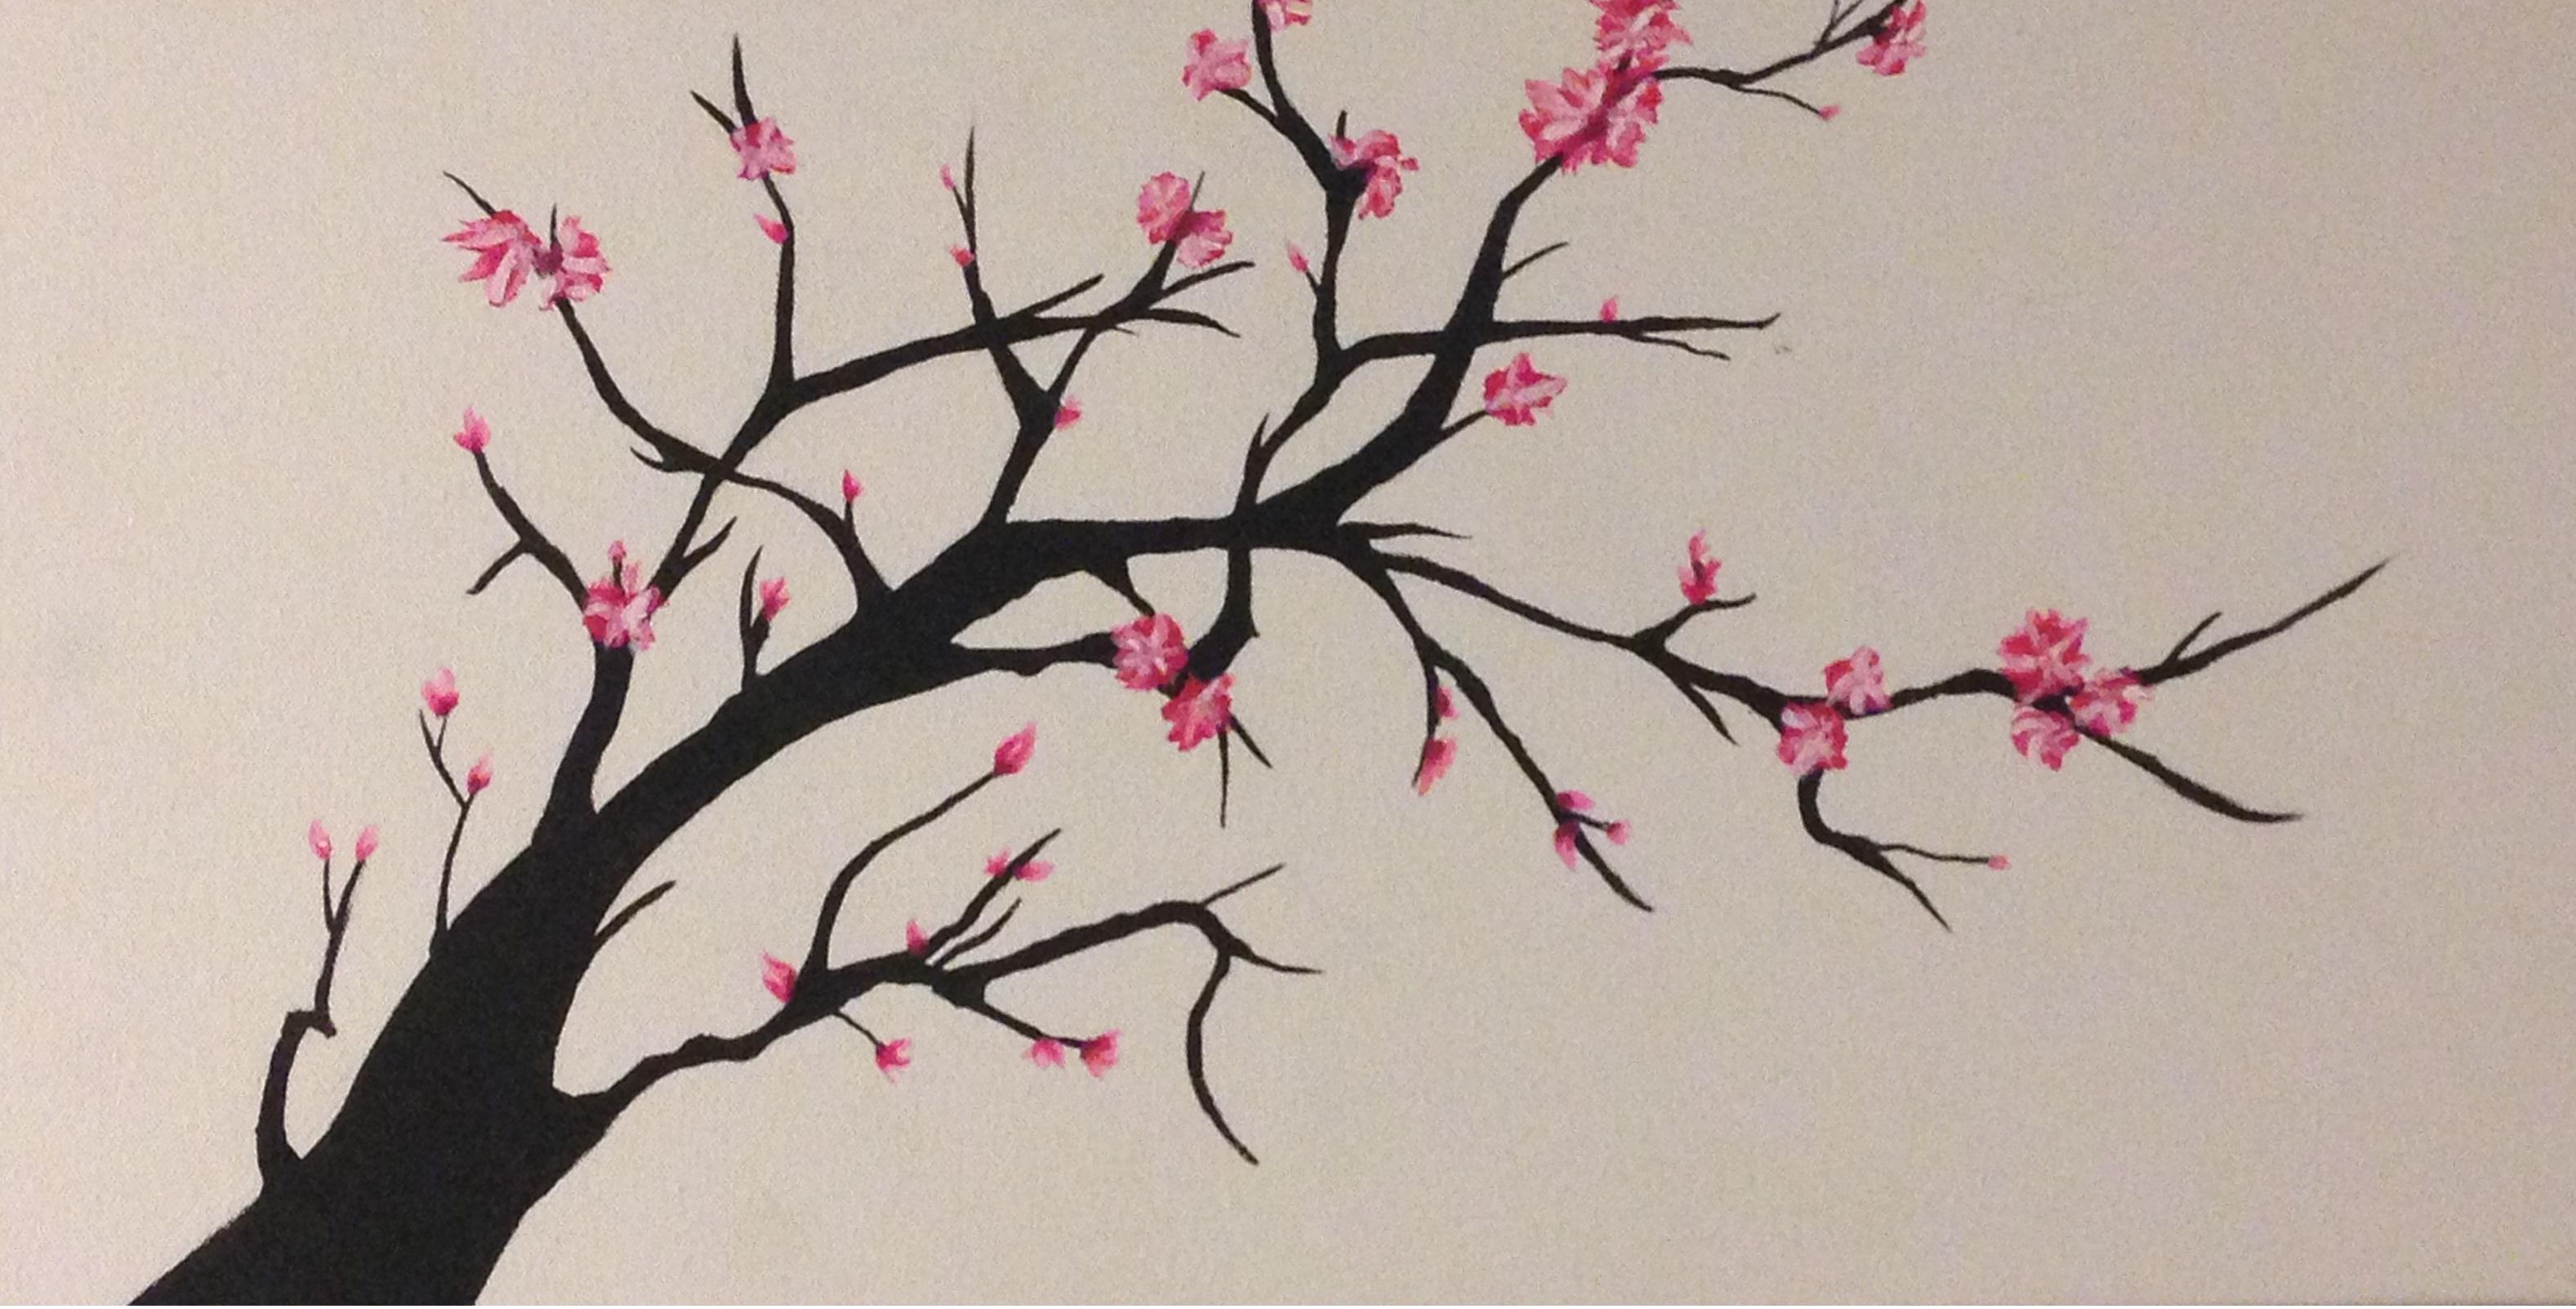 3154x1603 Drawing Of A Cherry Blossom Tree Drawn Tree Cherry Blossom Tree